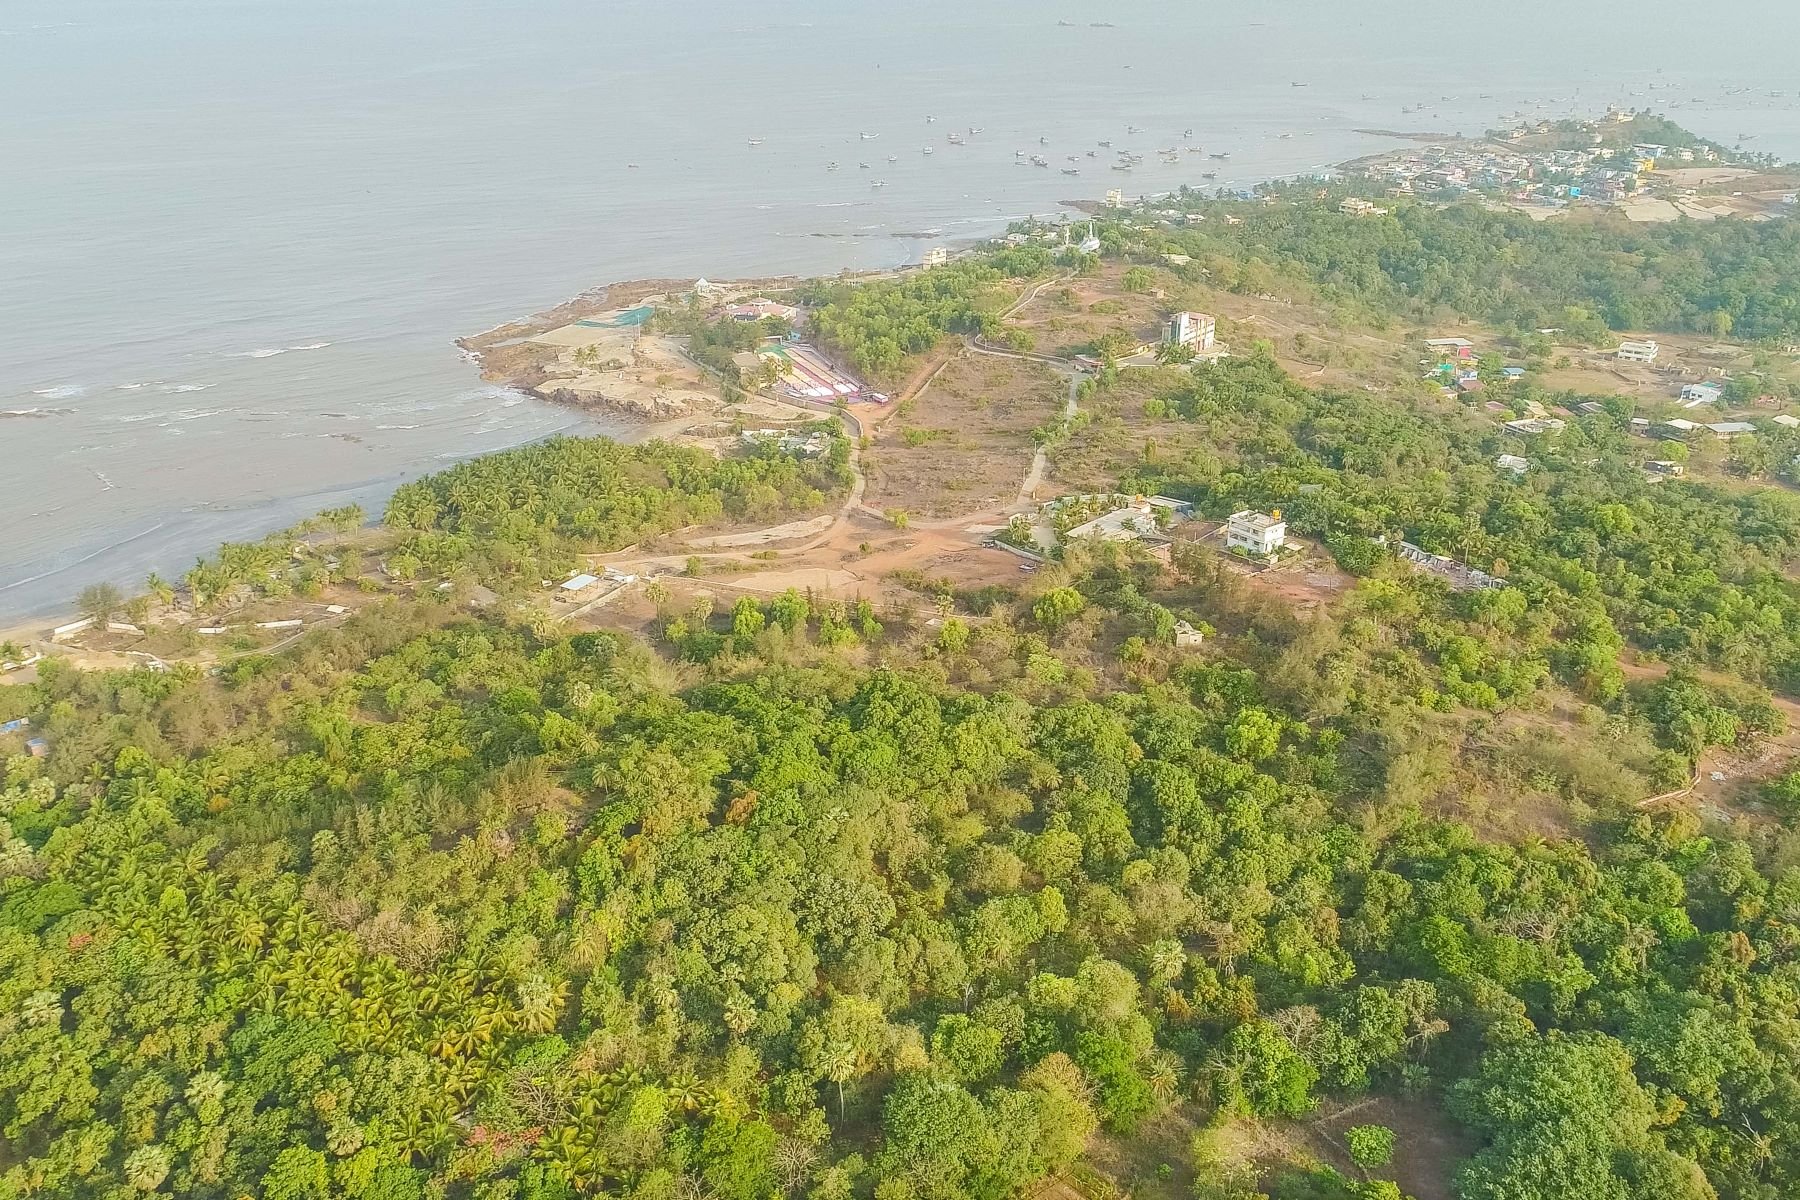 Land for Sale at Beachfront land parcel in Gorai-Uttan Mumbai, Maharashtra 401106 India